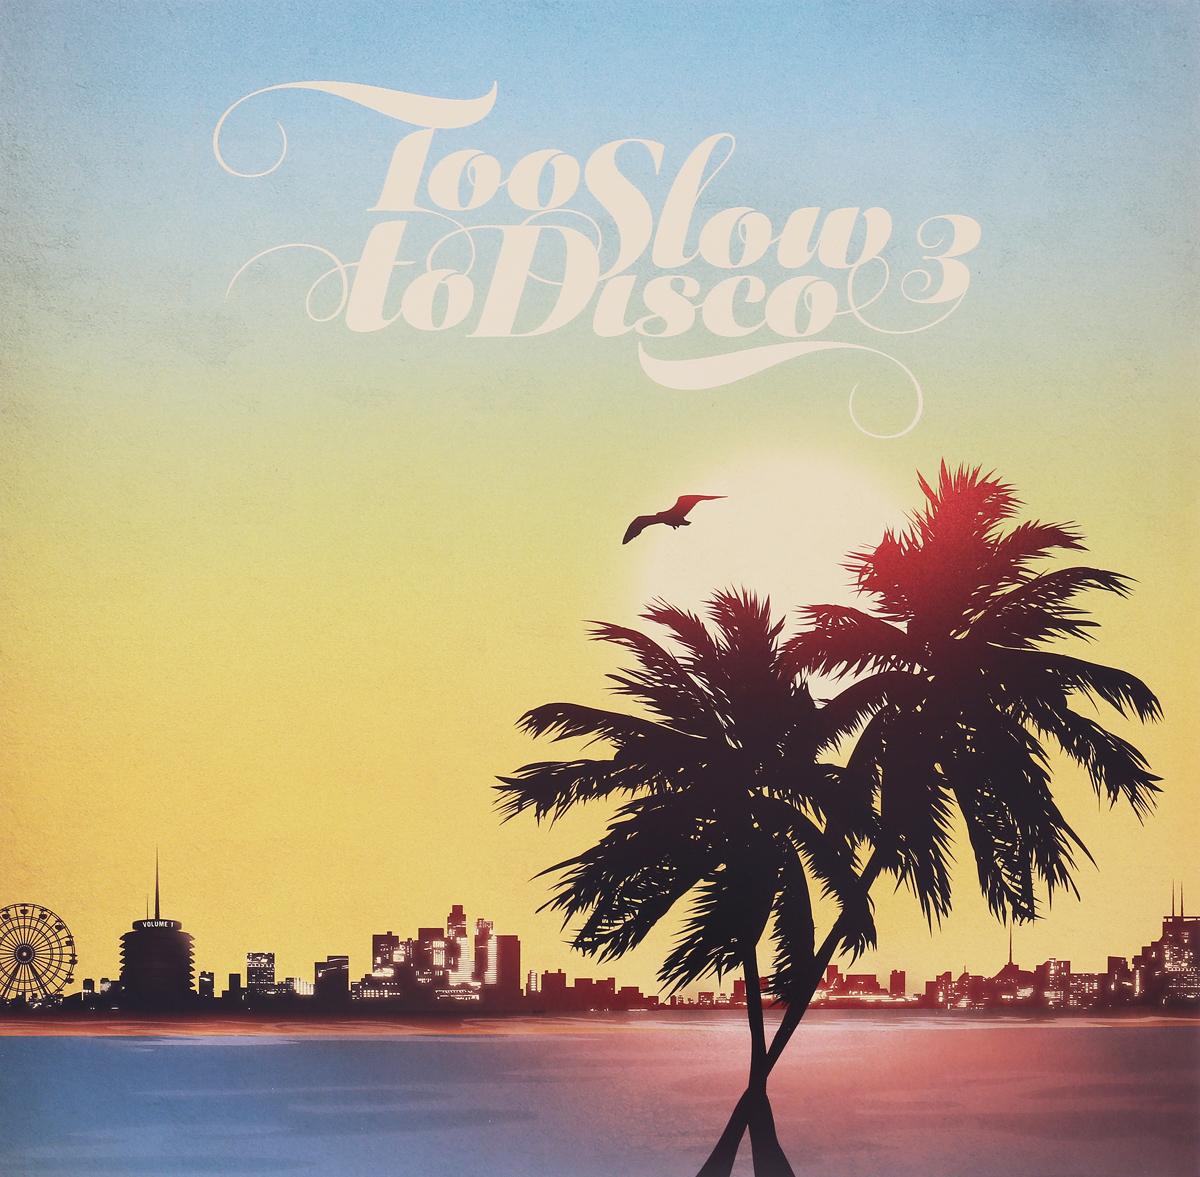 Too Slow To Disco 3 (2 LP) too slow to disco 3 2 lp